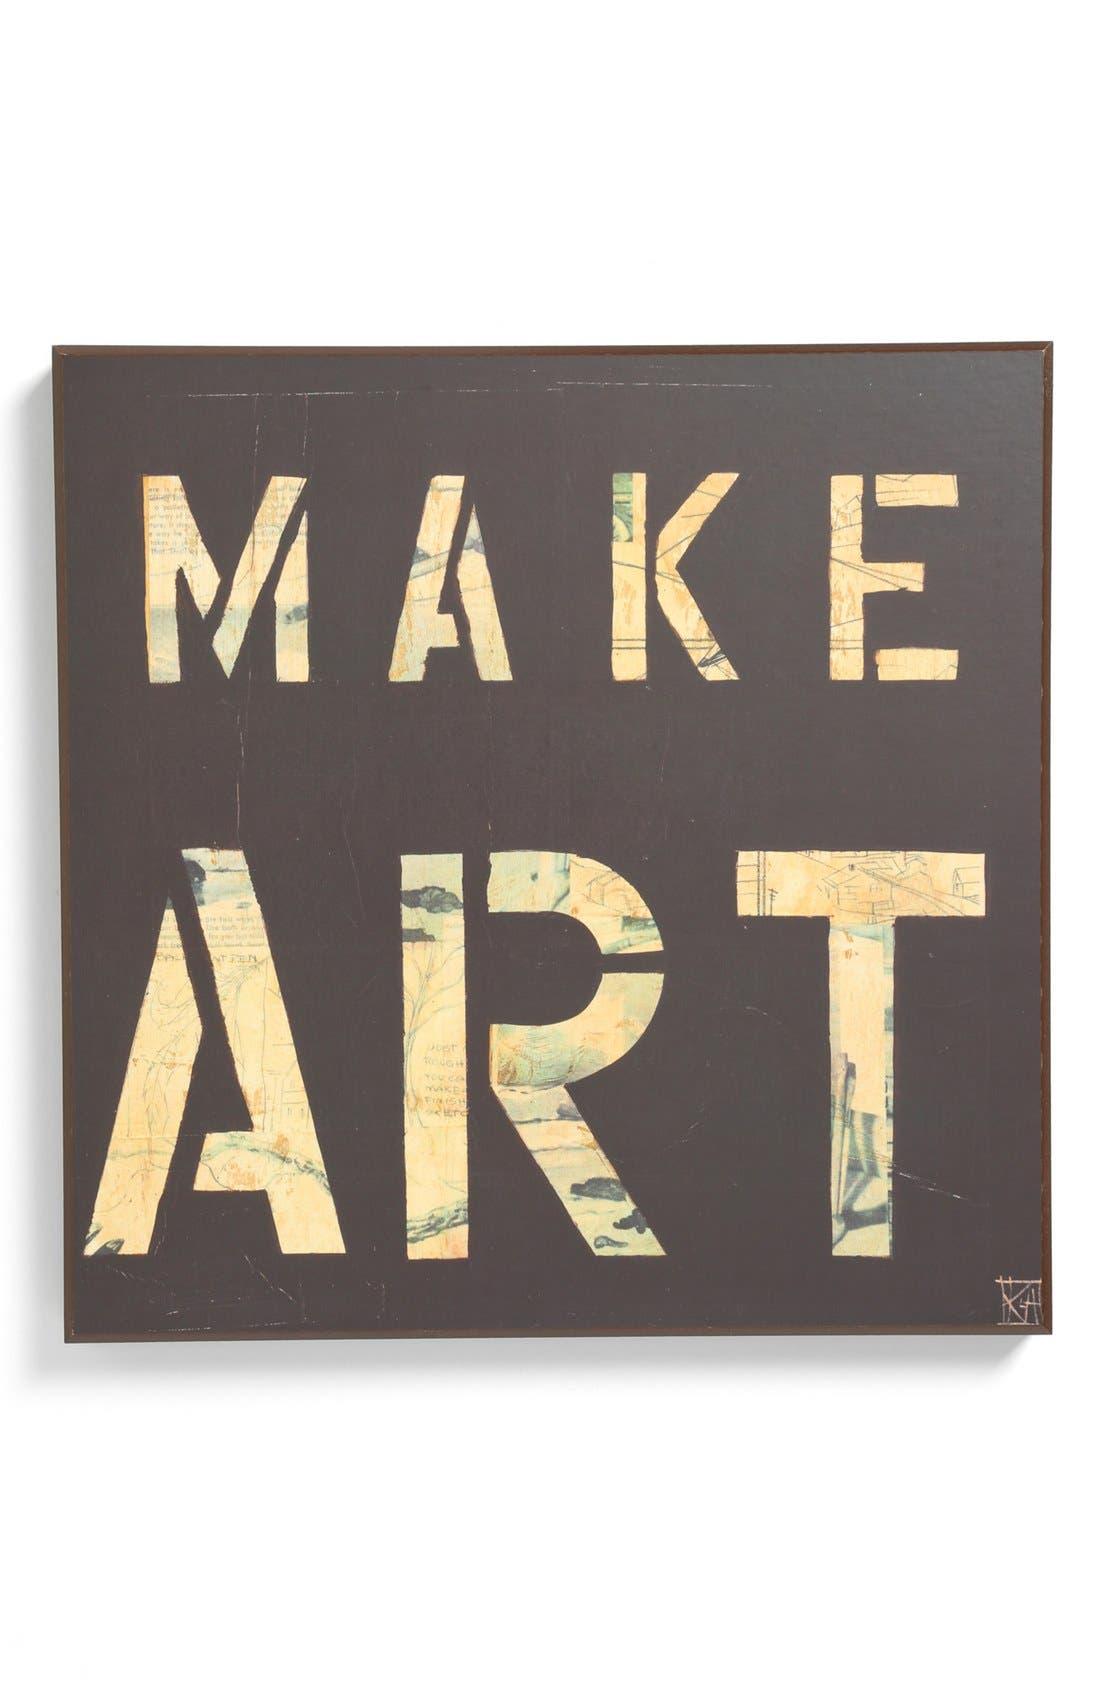 Alternate Image 1 Selected - Third and Wall Art 'Make Art' Sign